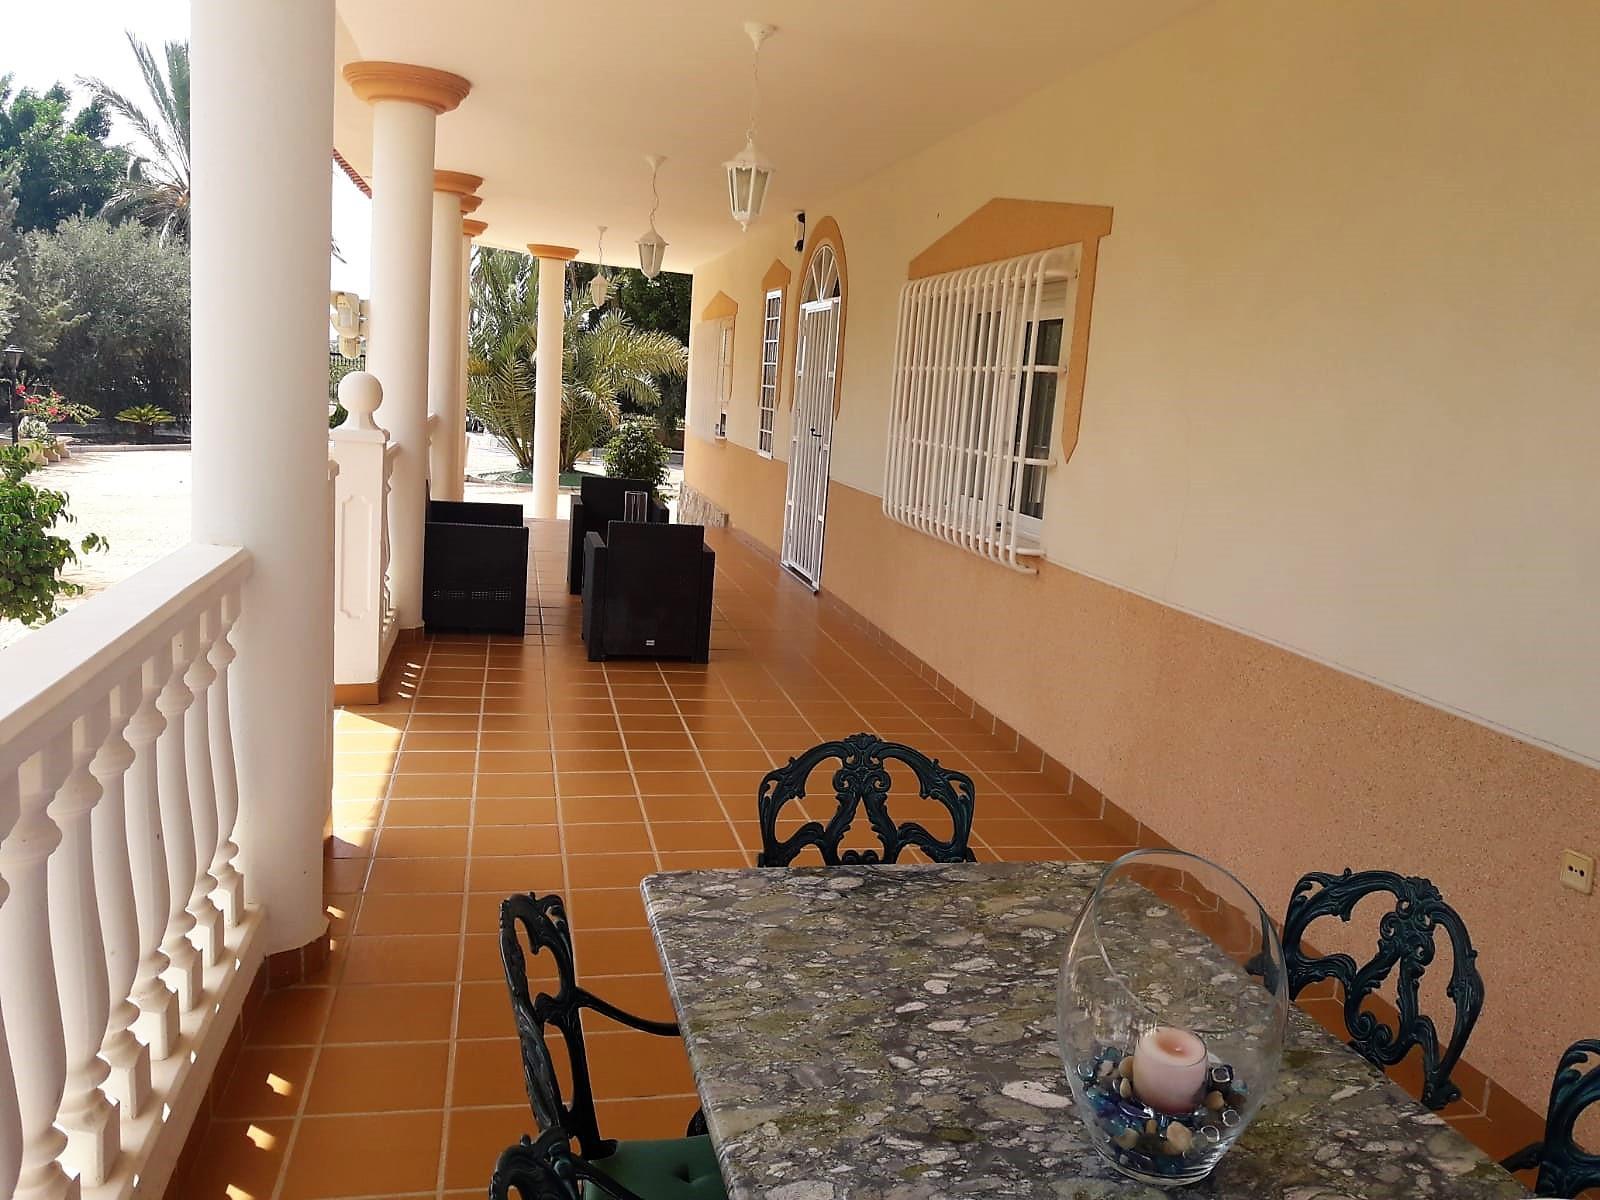 Maison - Murcia - #4134055-4